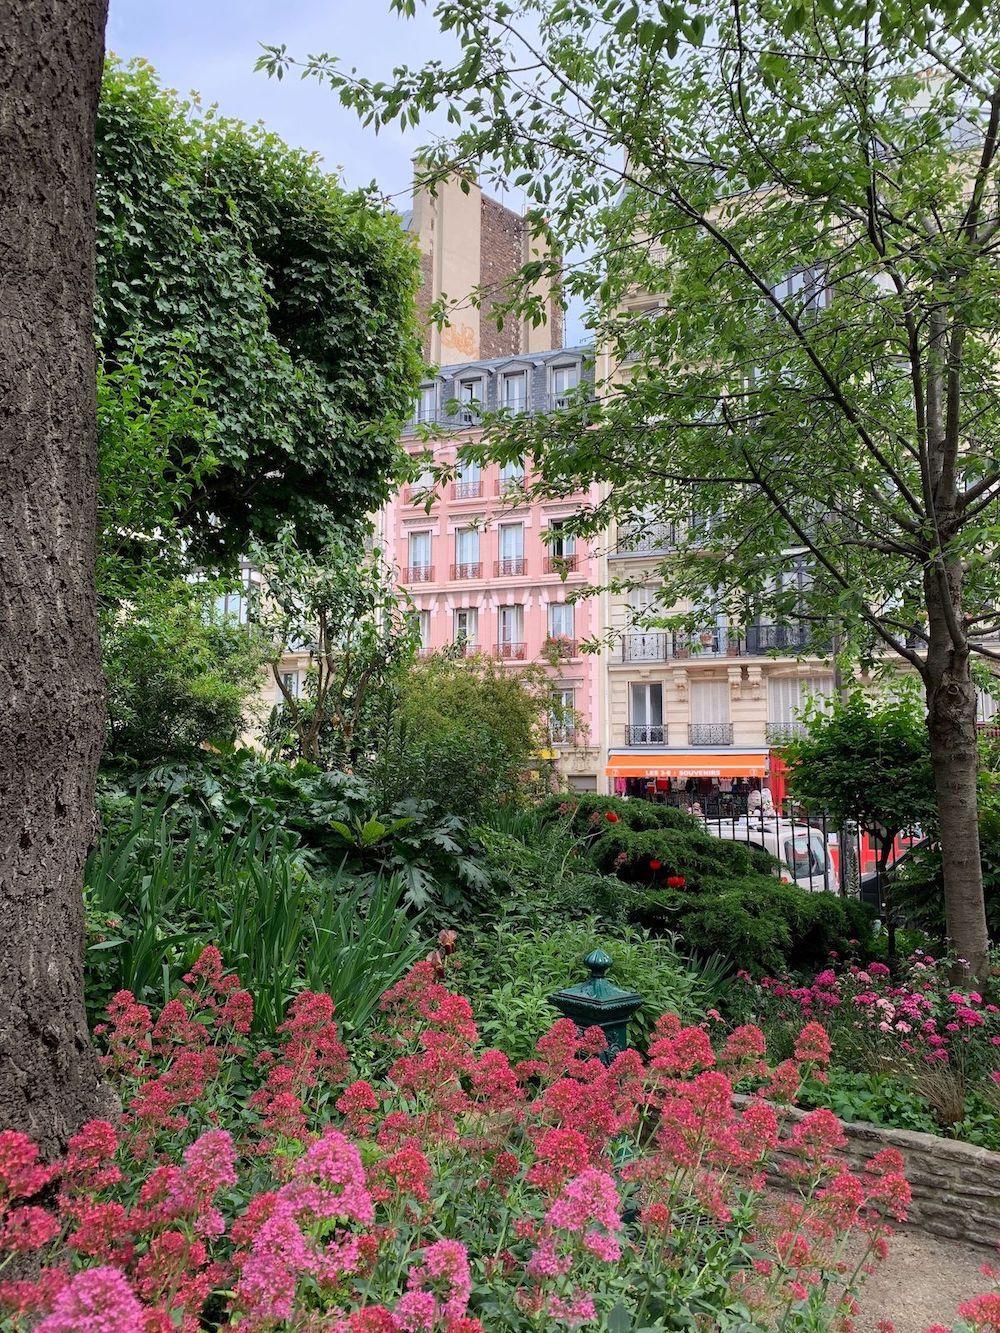 The cute pink apartment building in Paris